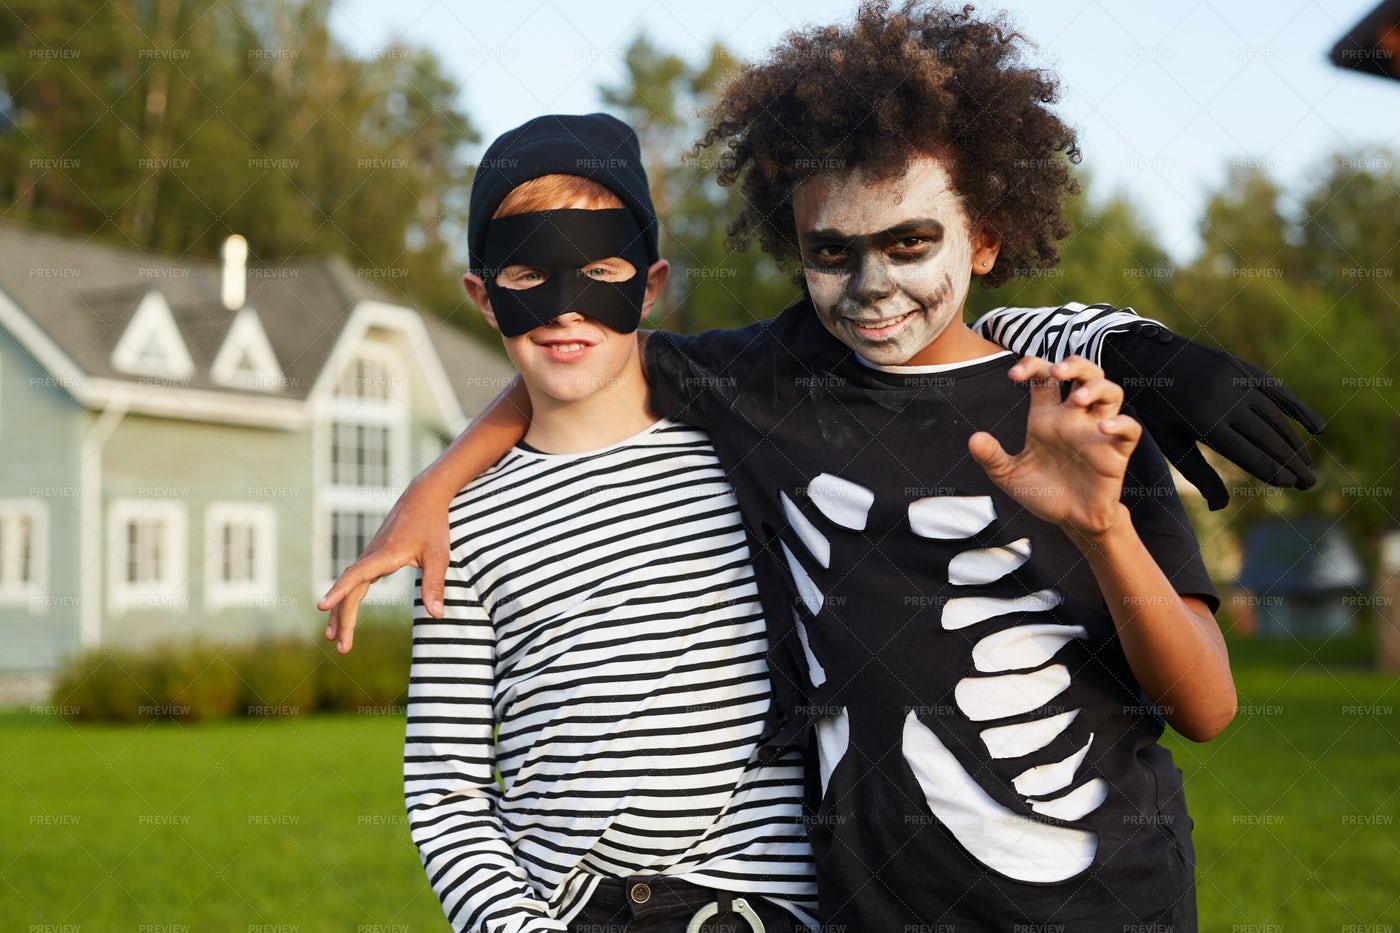 Friends Posing On Halloween: Stock Photos